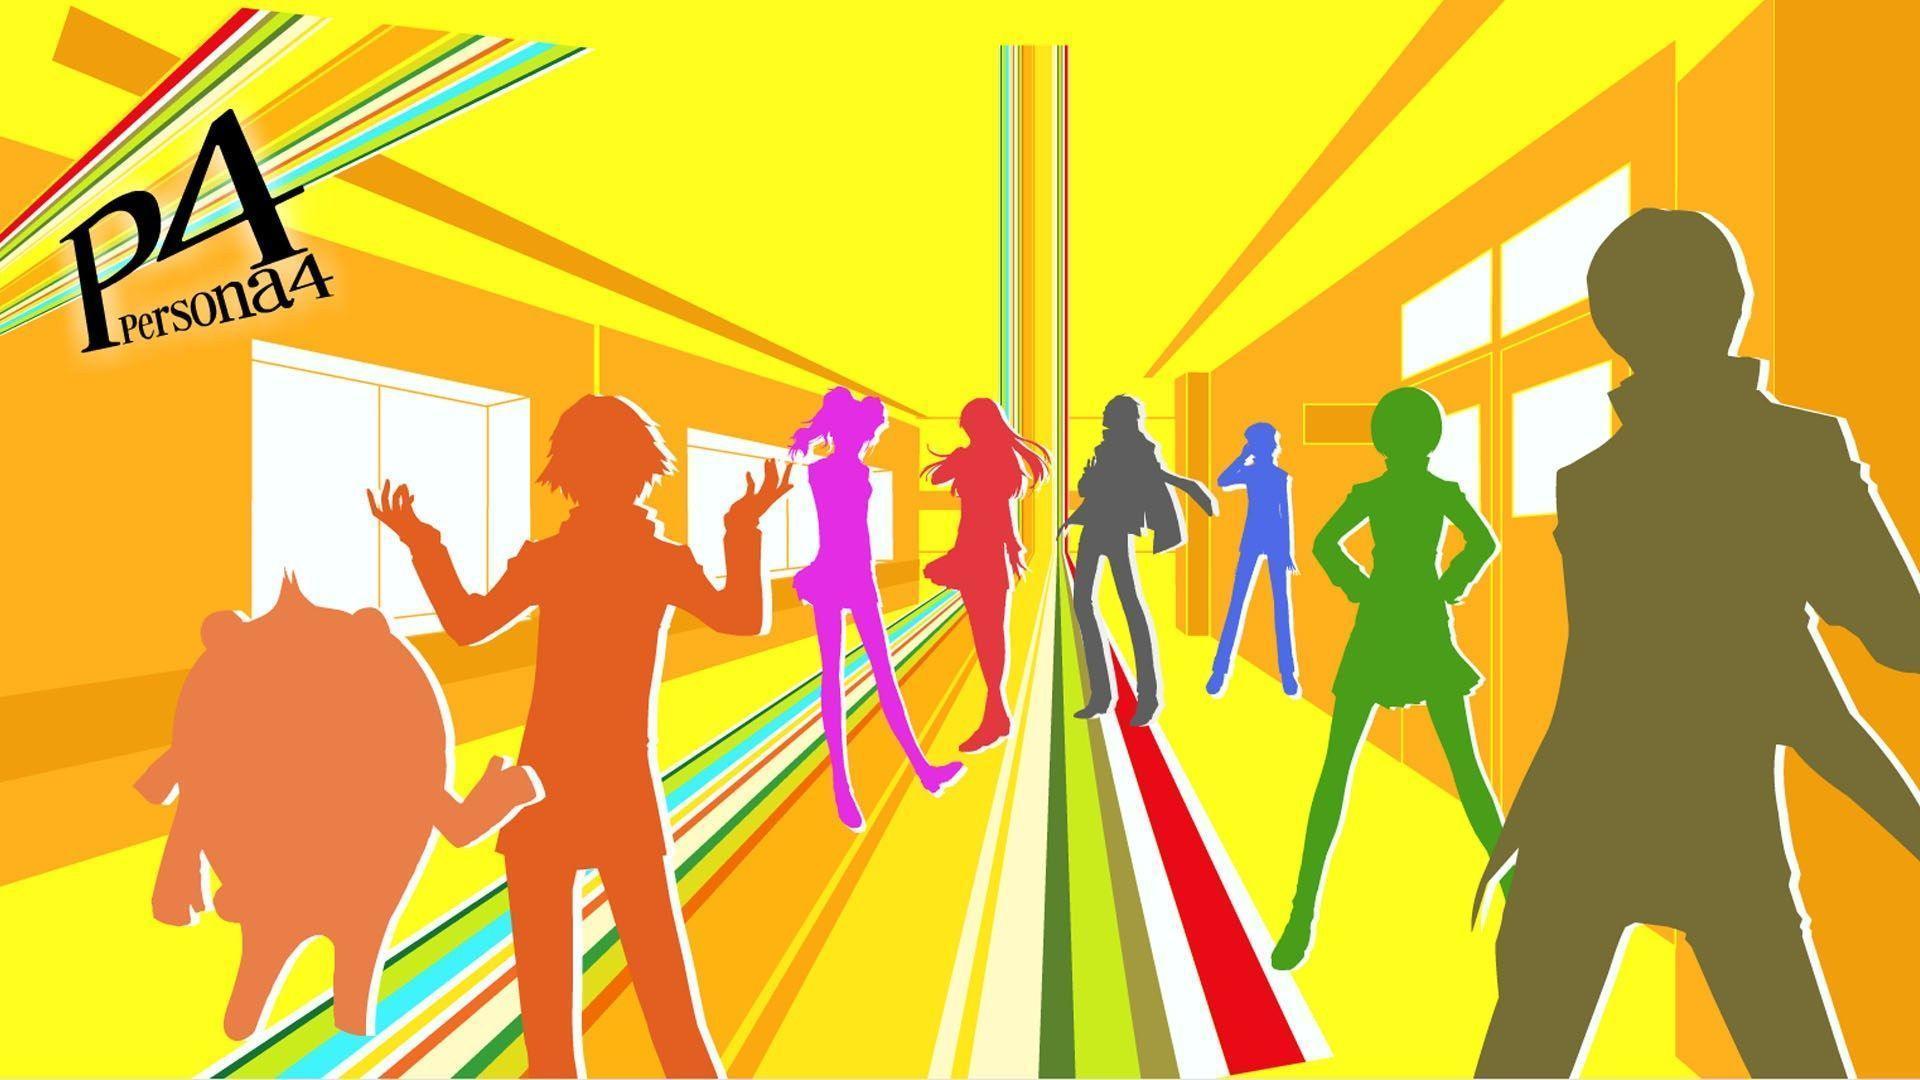 persona 4 wallpapers wallpaper cave